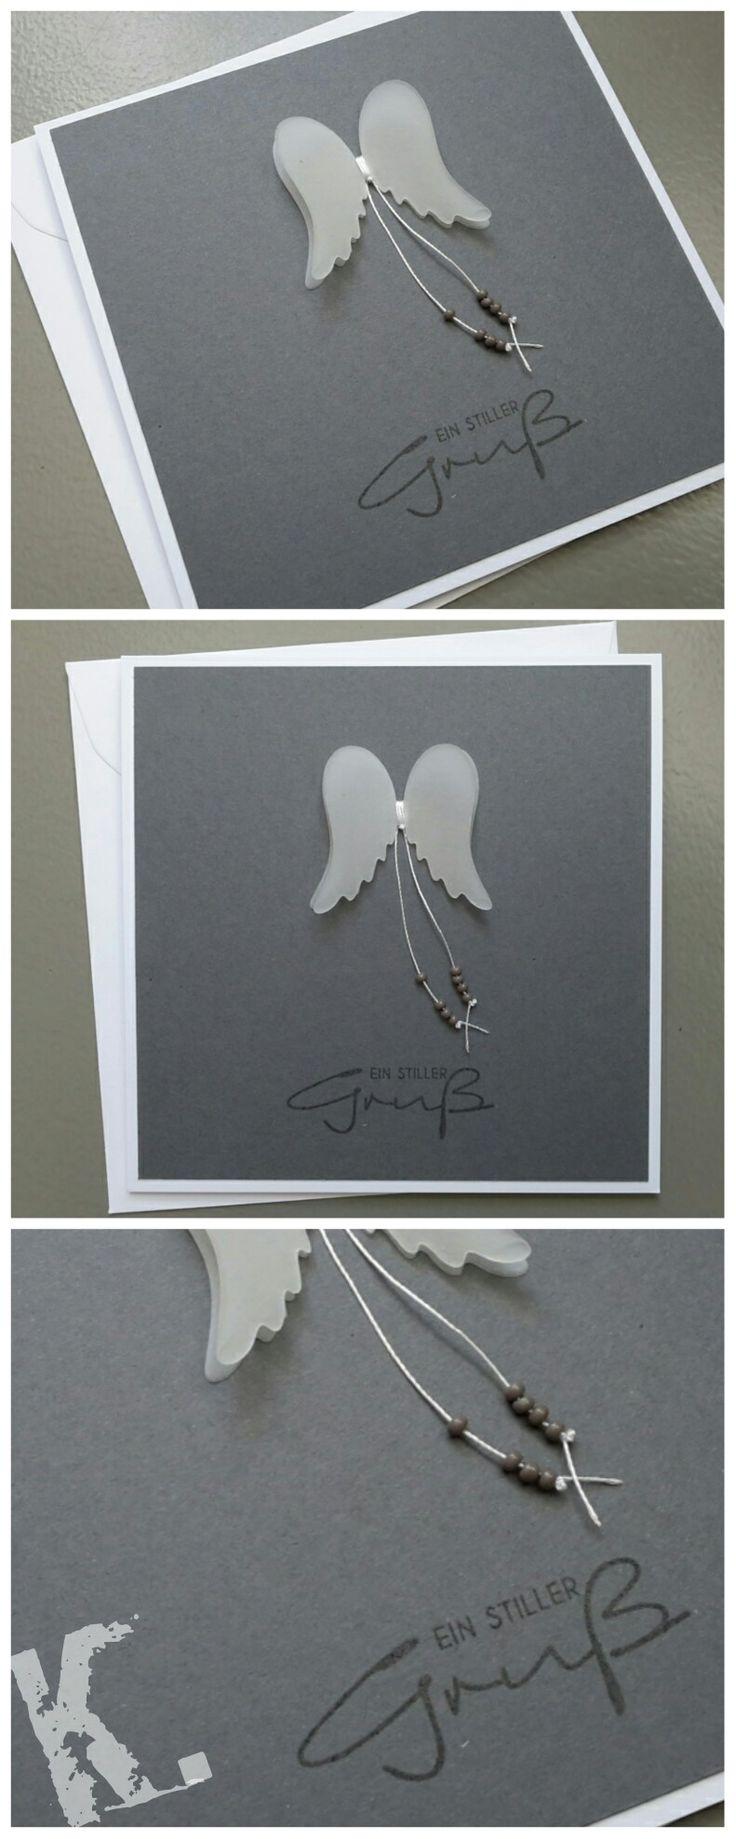 Trauerkarte Papier Stampin'Up! Flügel A.Renke Stempel inkystamp